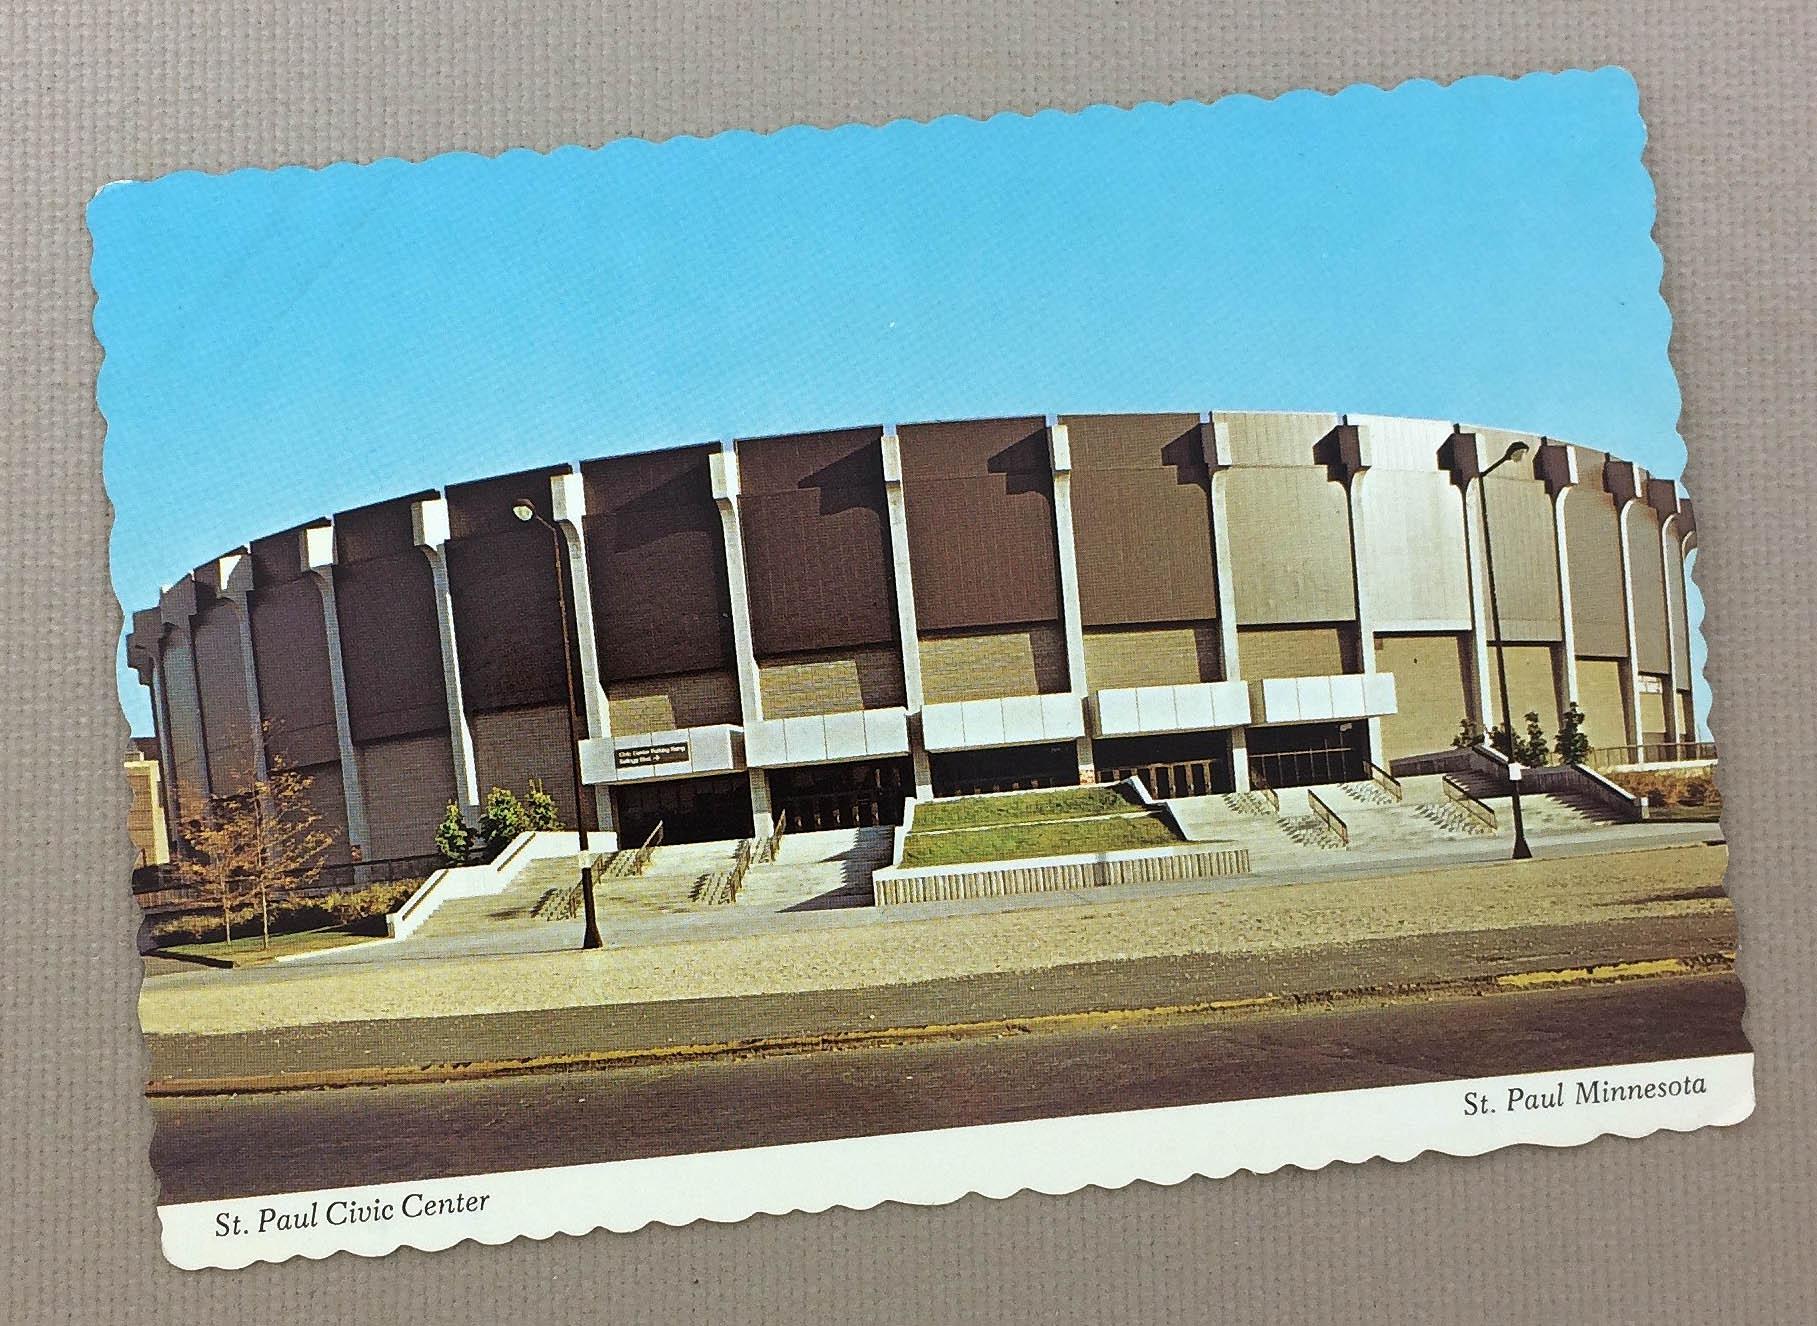 St Paul Civic Center